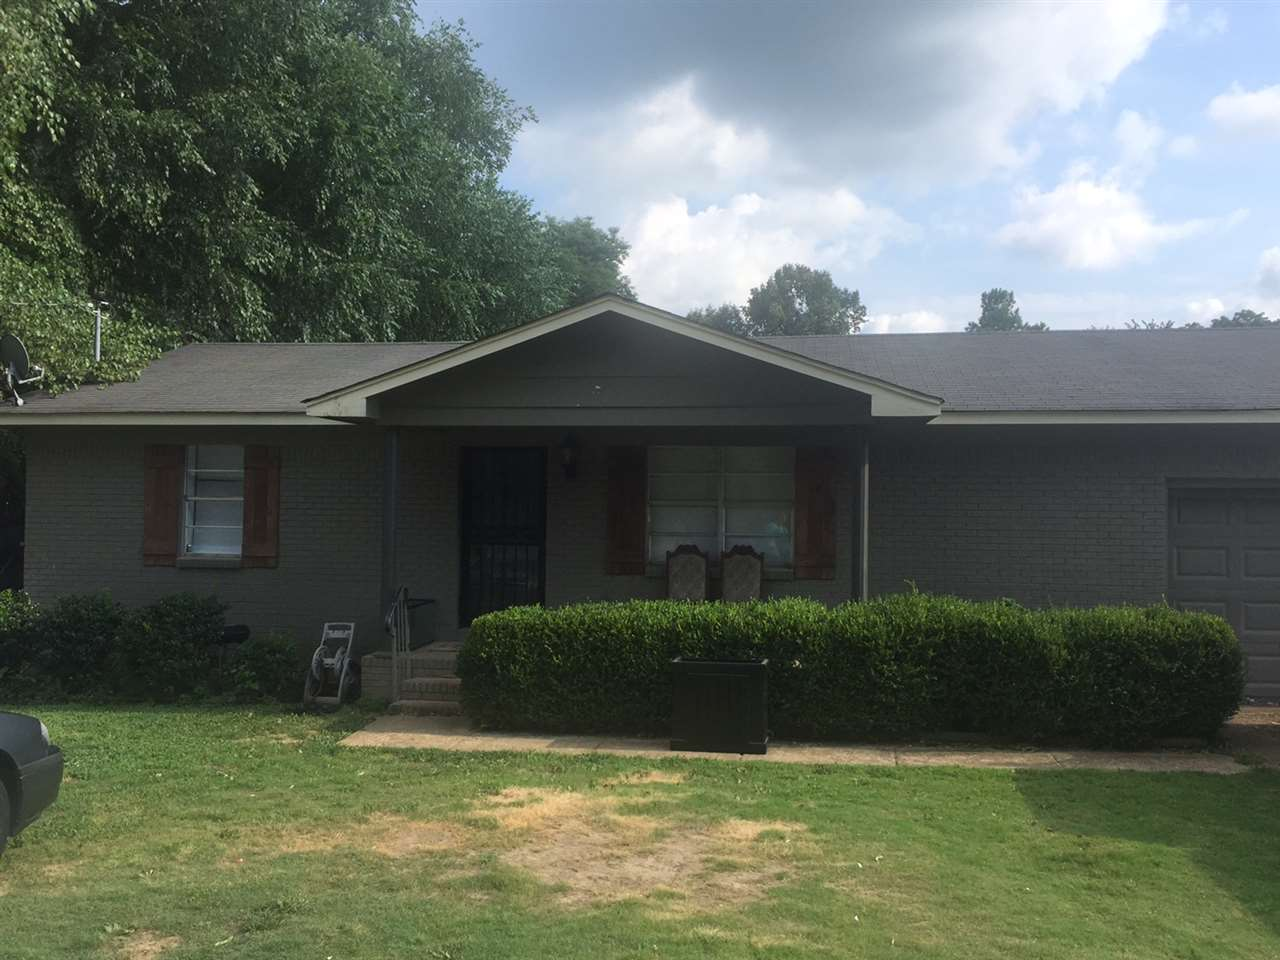 511 Edgewood Covington, TN 38019 - MLS #: 10008576